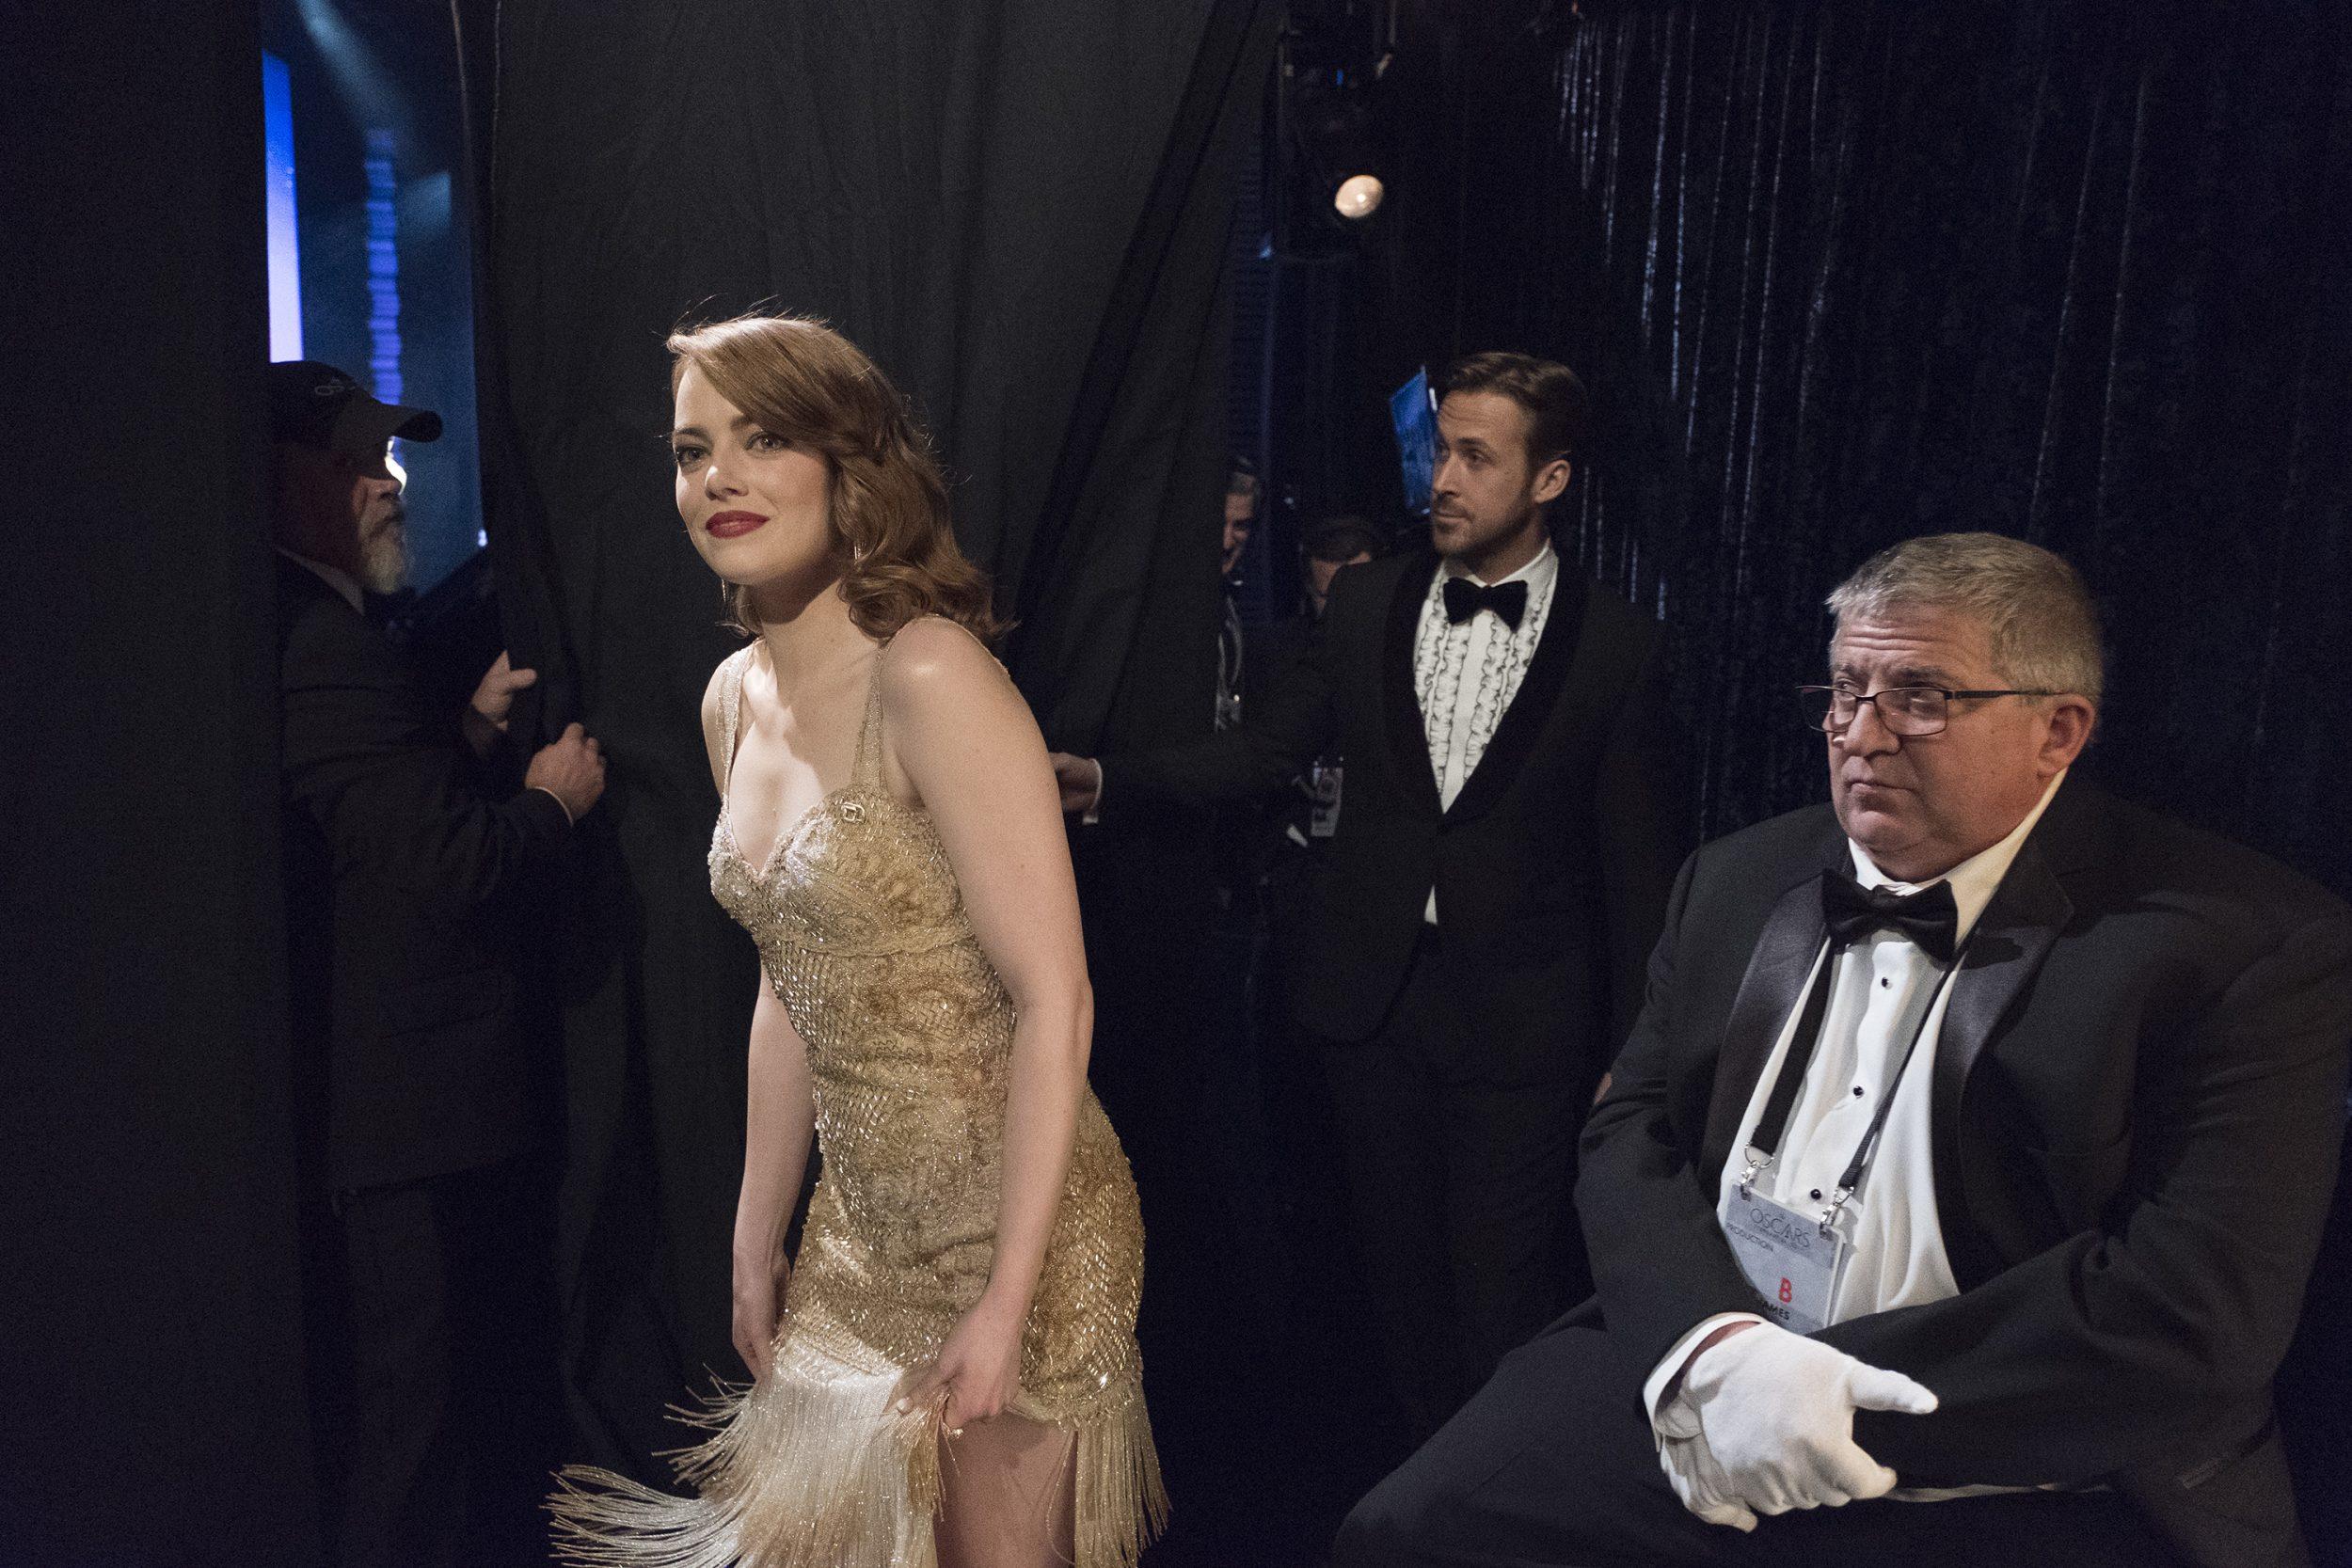 THE OSCARS(r) - The 89th Oscars(r)  broadcasts live on Oscar(r) SUNDAY, FEBRUARY 26, 2017, on the ABC Television Network. (ABC/Adam Rose) EMMA STONE, RYAN GOSLING